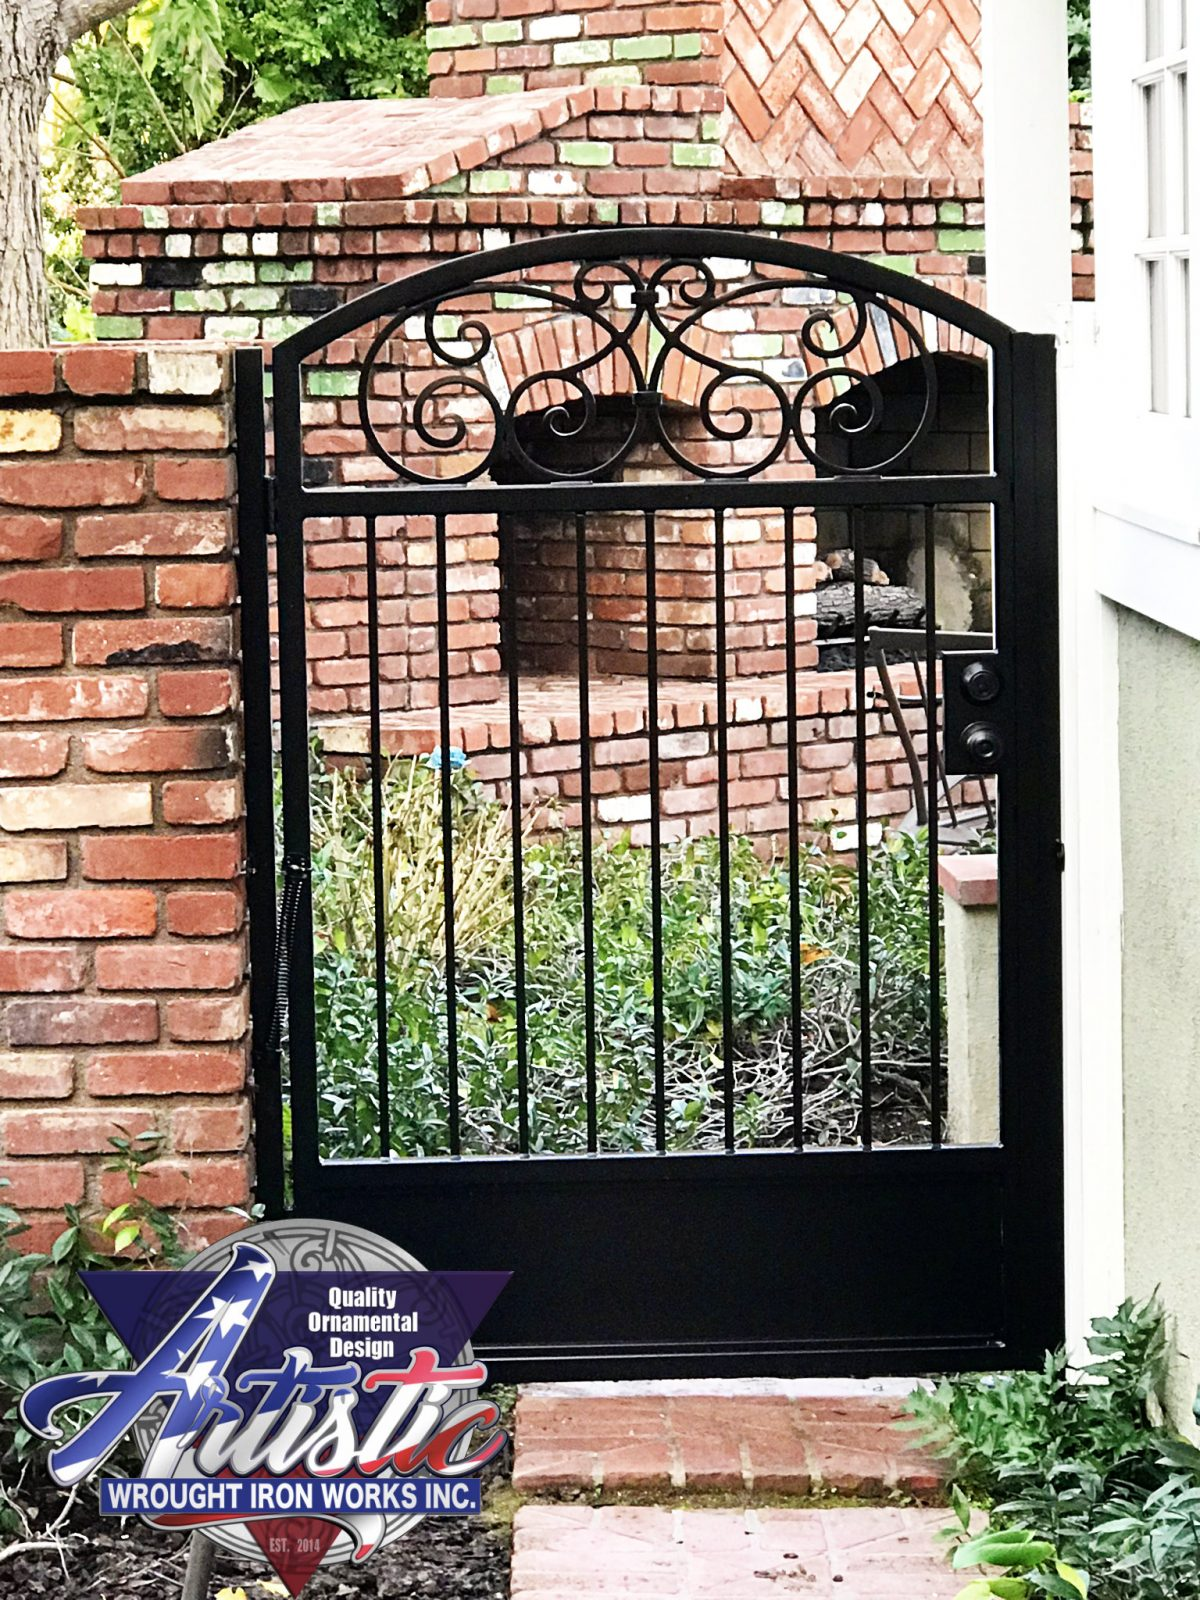 Black Iron Side Gate 1352 - Artistic Wrought Iron Works Inc